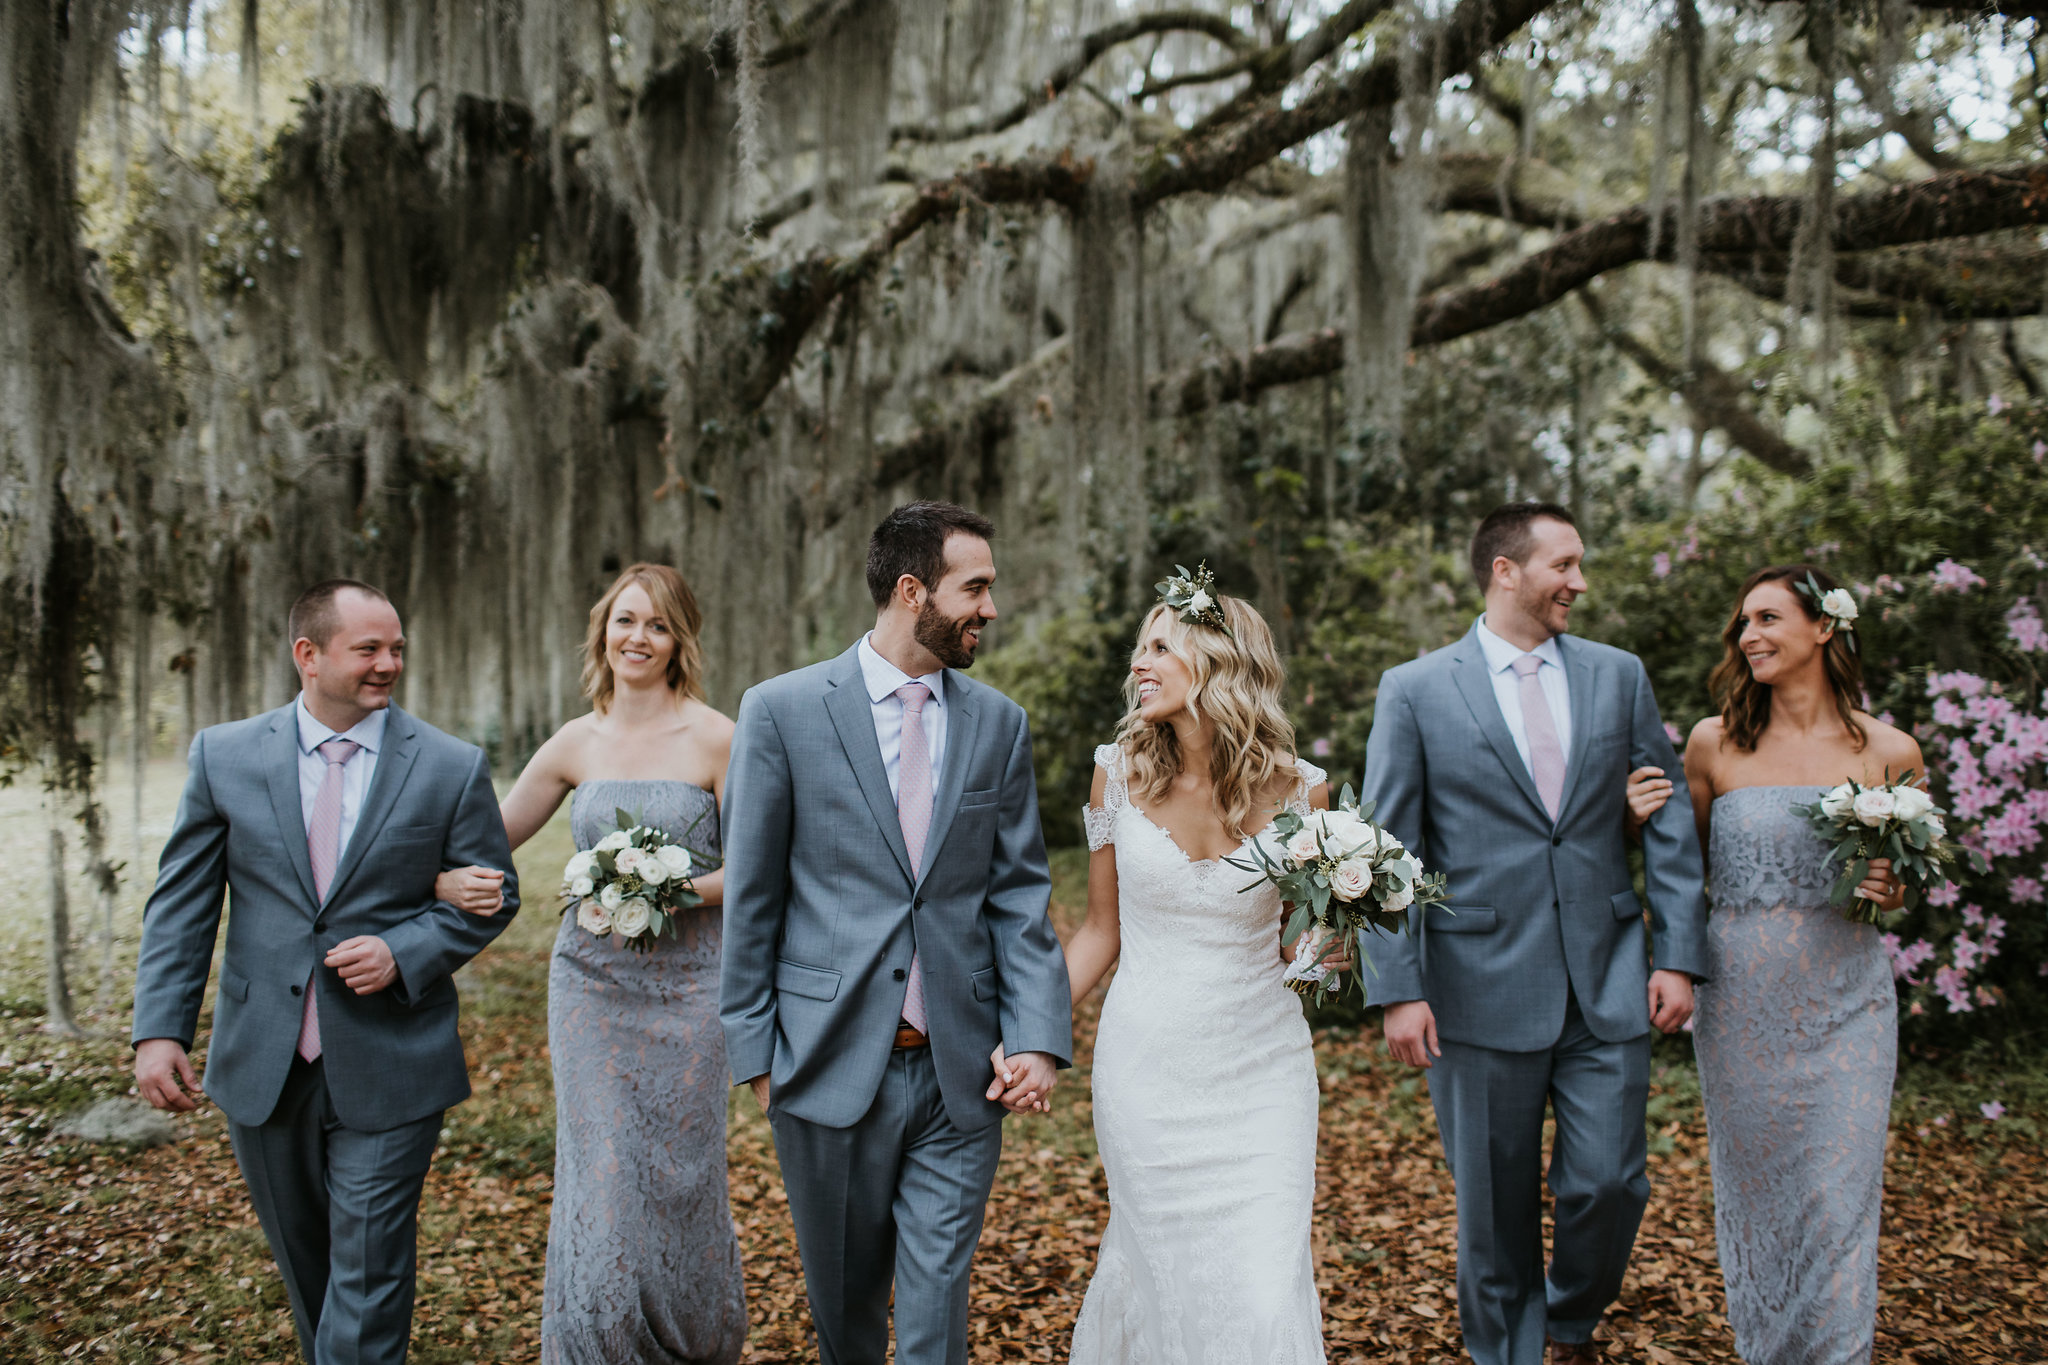 Legare-Waring-House-Charleston-SC-wedding-portrait-photography-315.jpg